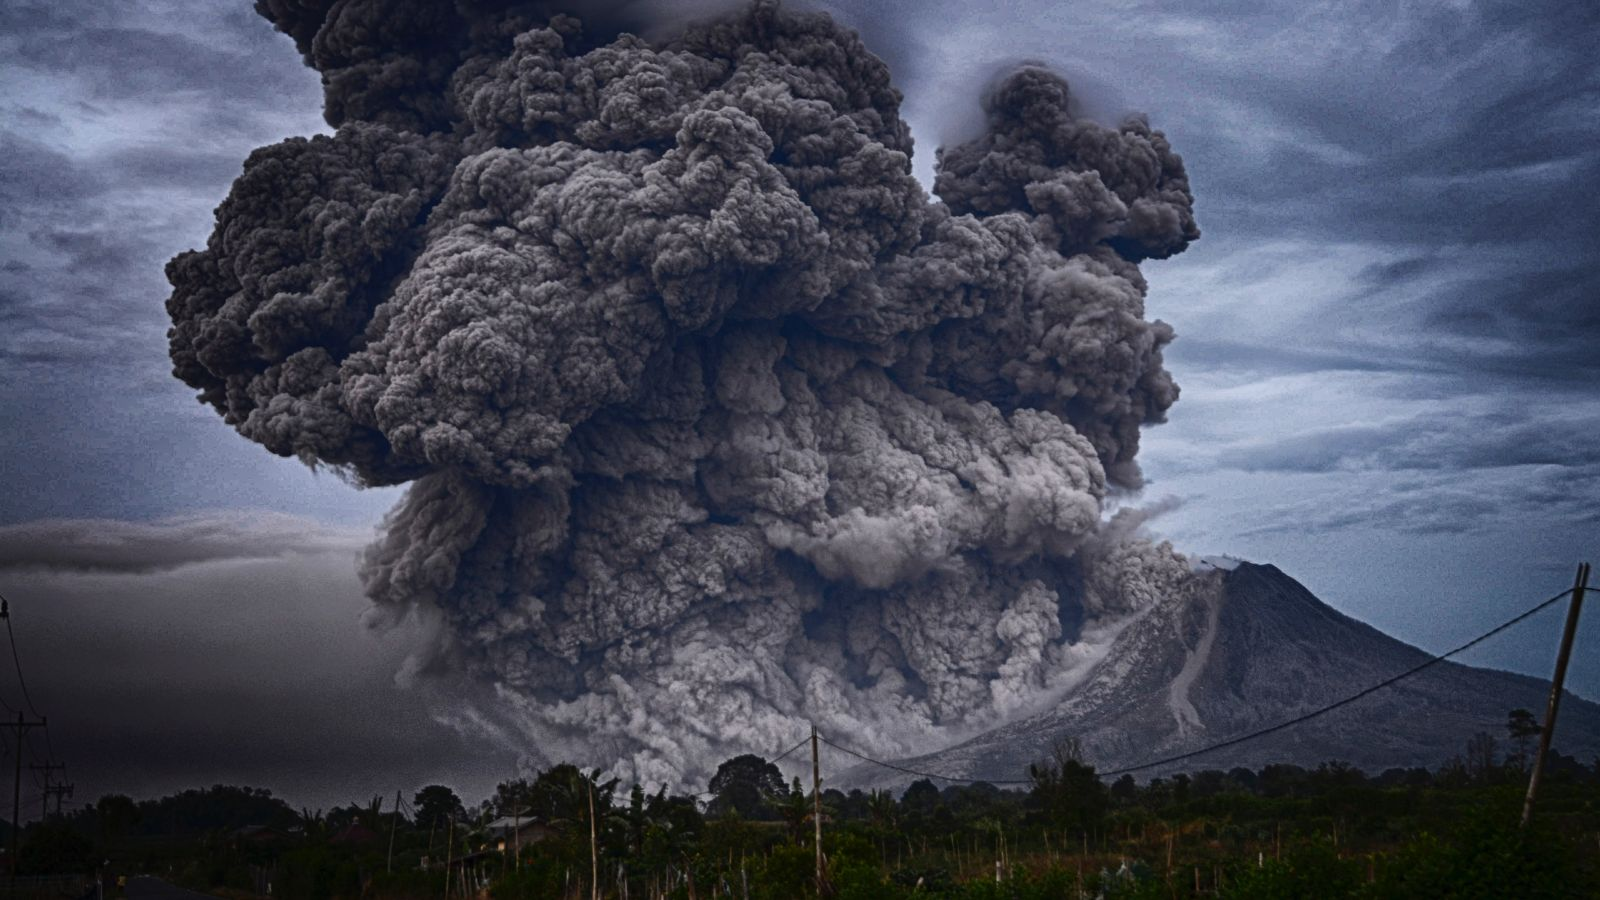 Massive billowing clouds from an eruption of Mt Sinabung, Indonesia. Photo: Yosh Ginsu, Unsplash.